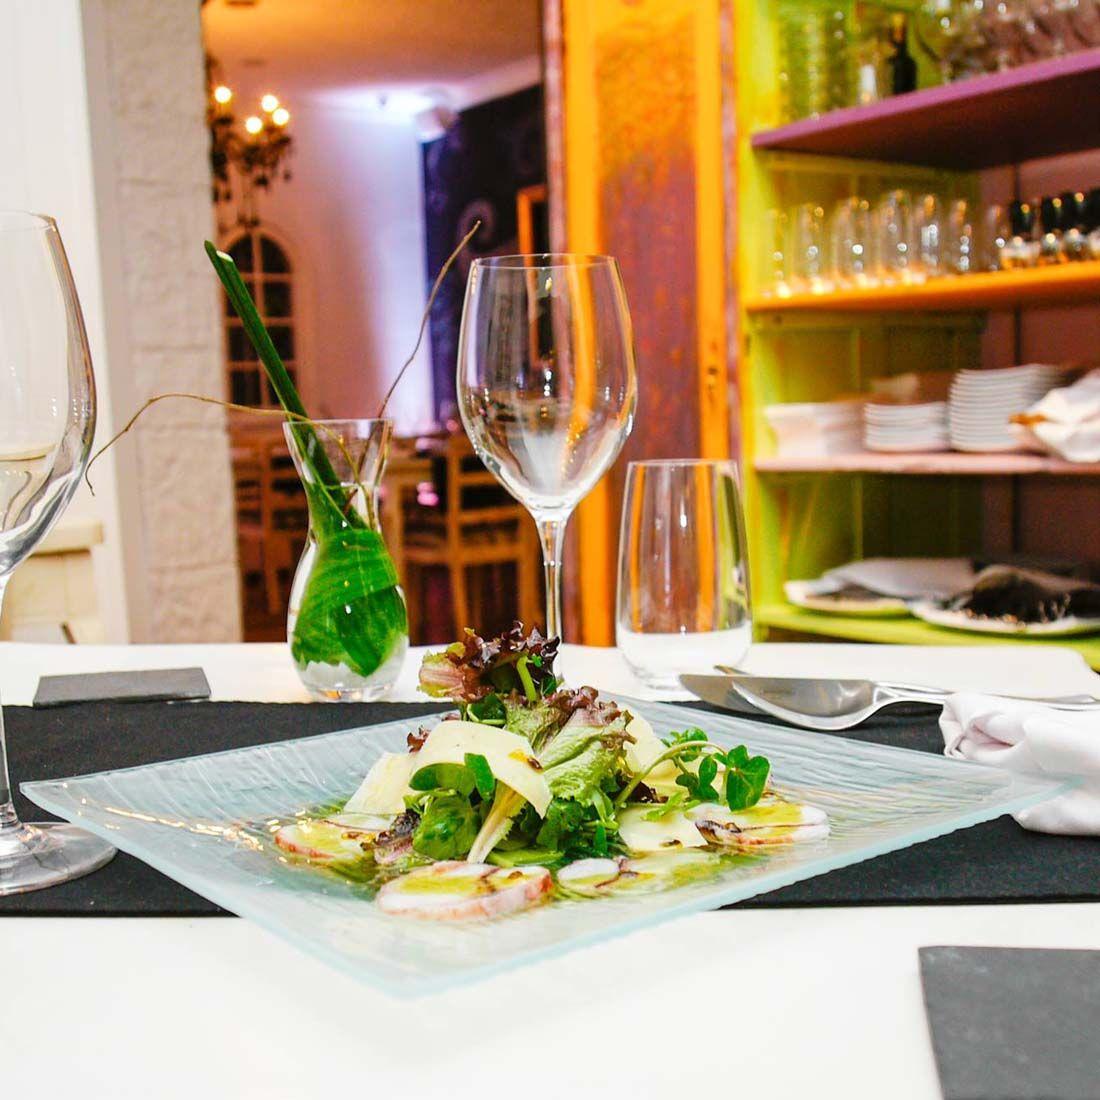 BAR ITALIA Restaurante - Reserva en restaurantes de Comida LIBRE DE GLUTEN - PROVIDENCIA - MESA 24/7 | SANTIAGO - Perú